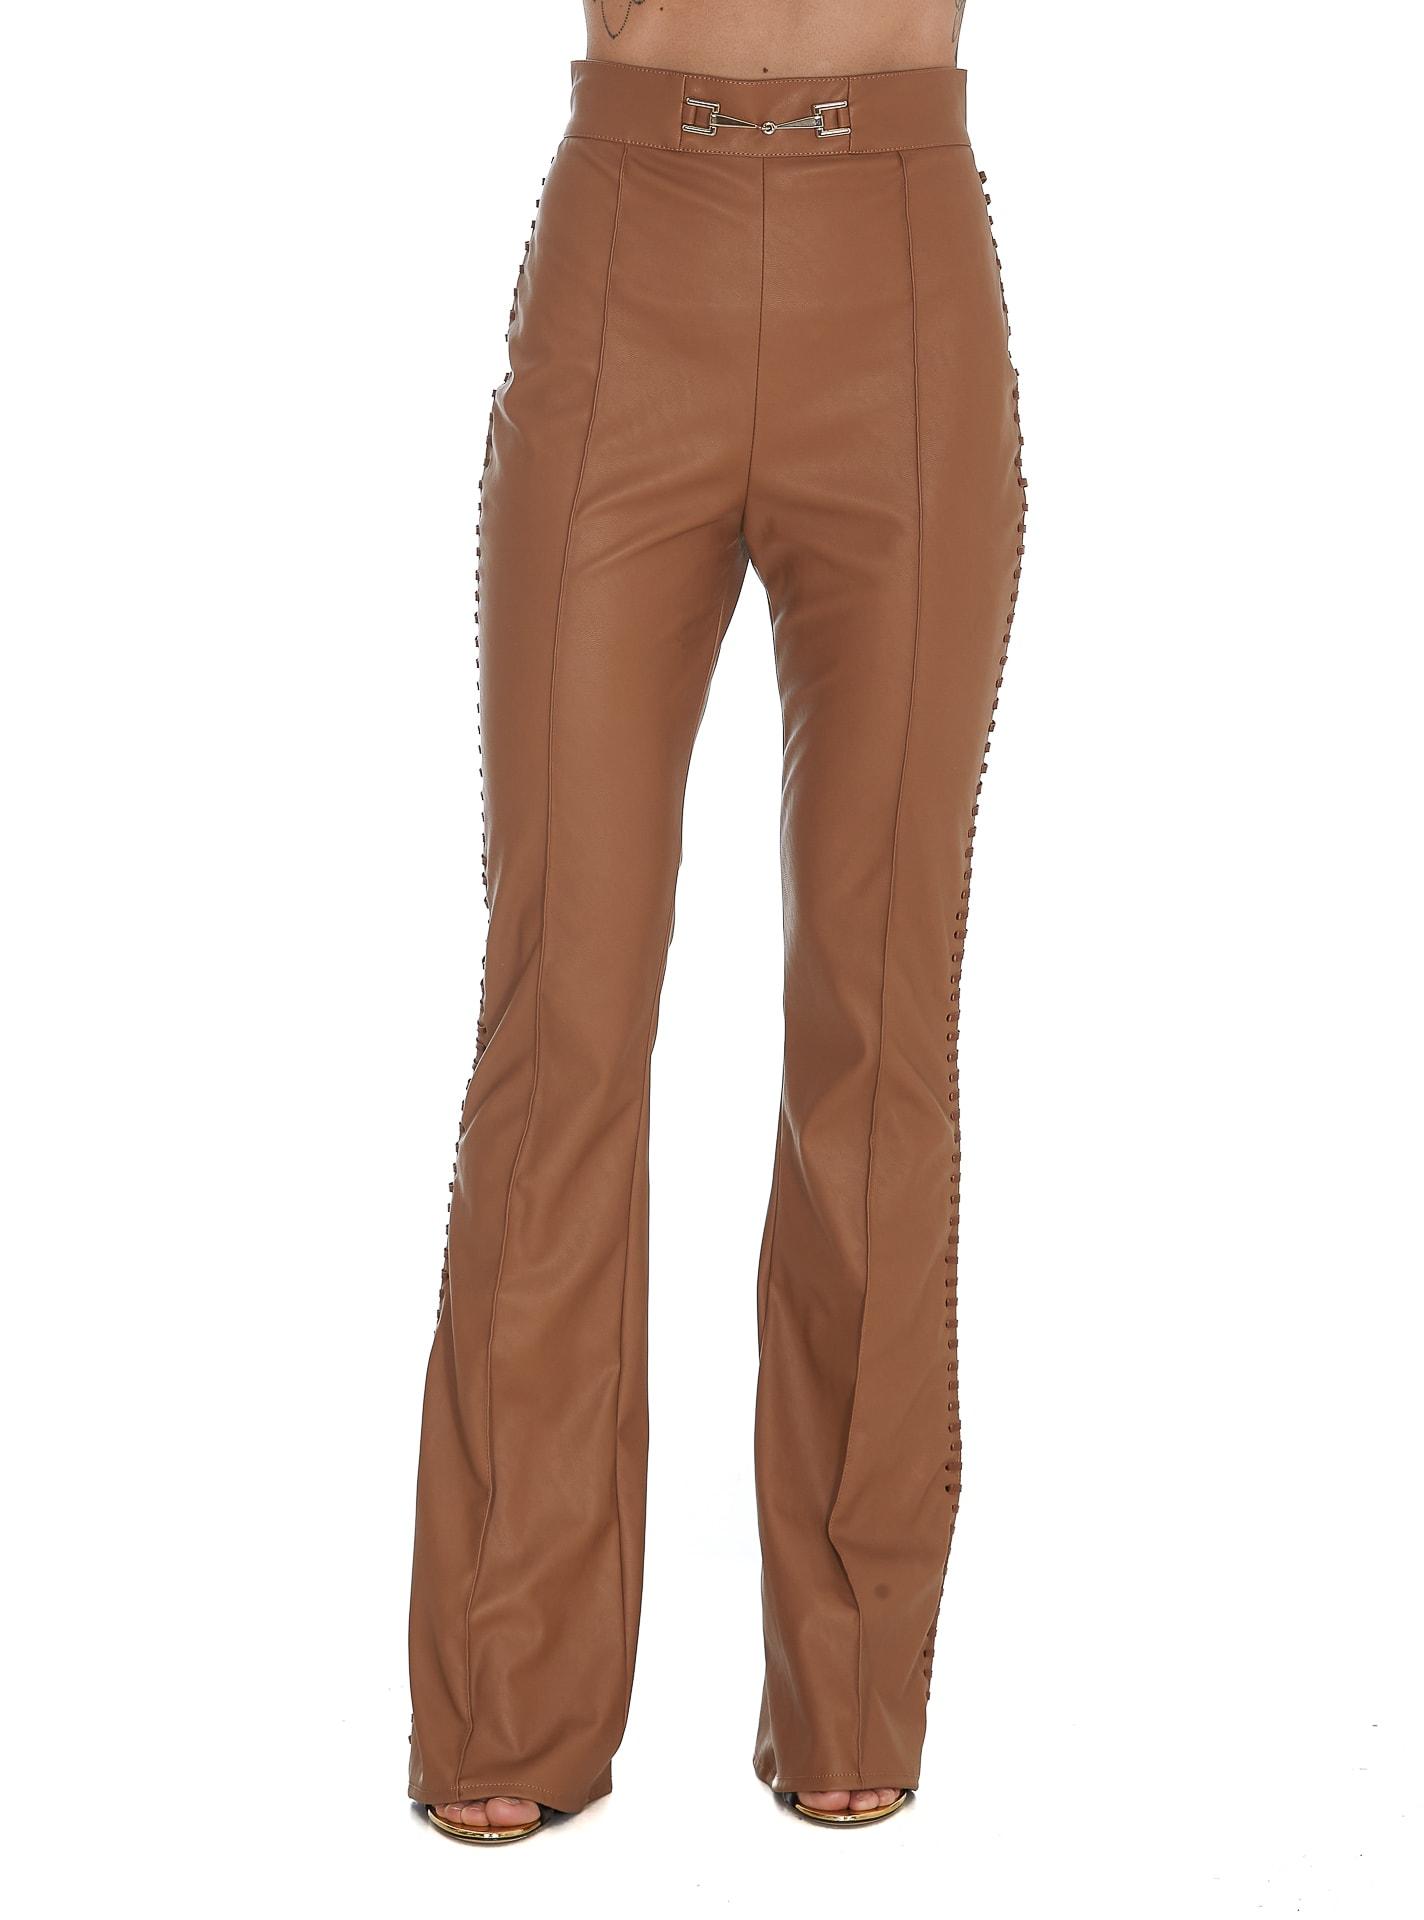 Elisabetta Franchi Pants In Brown